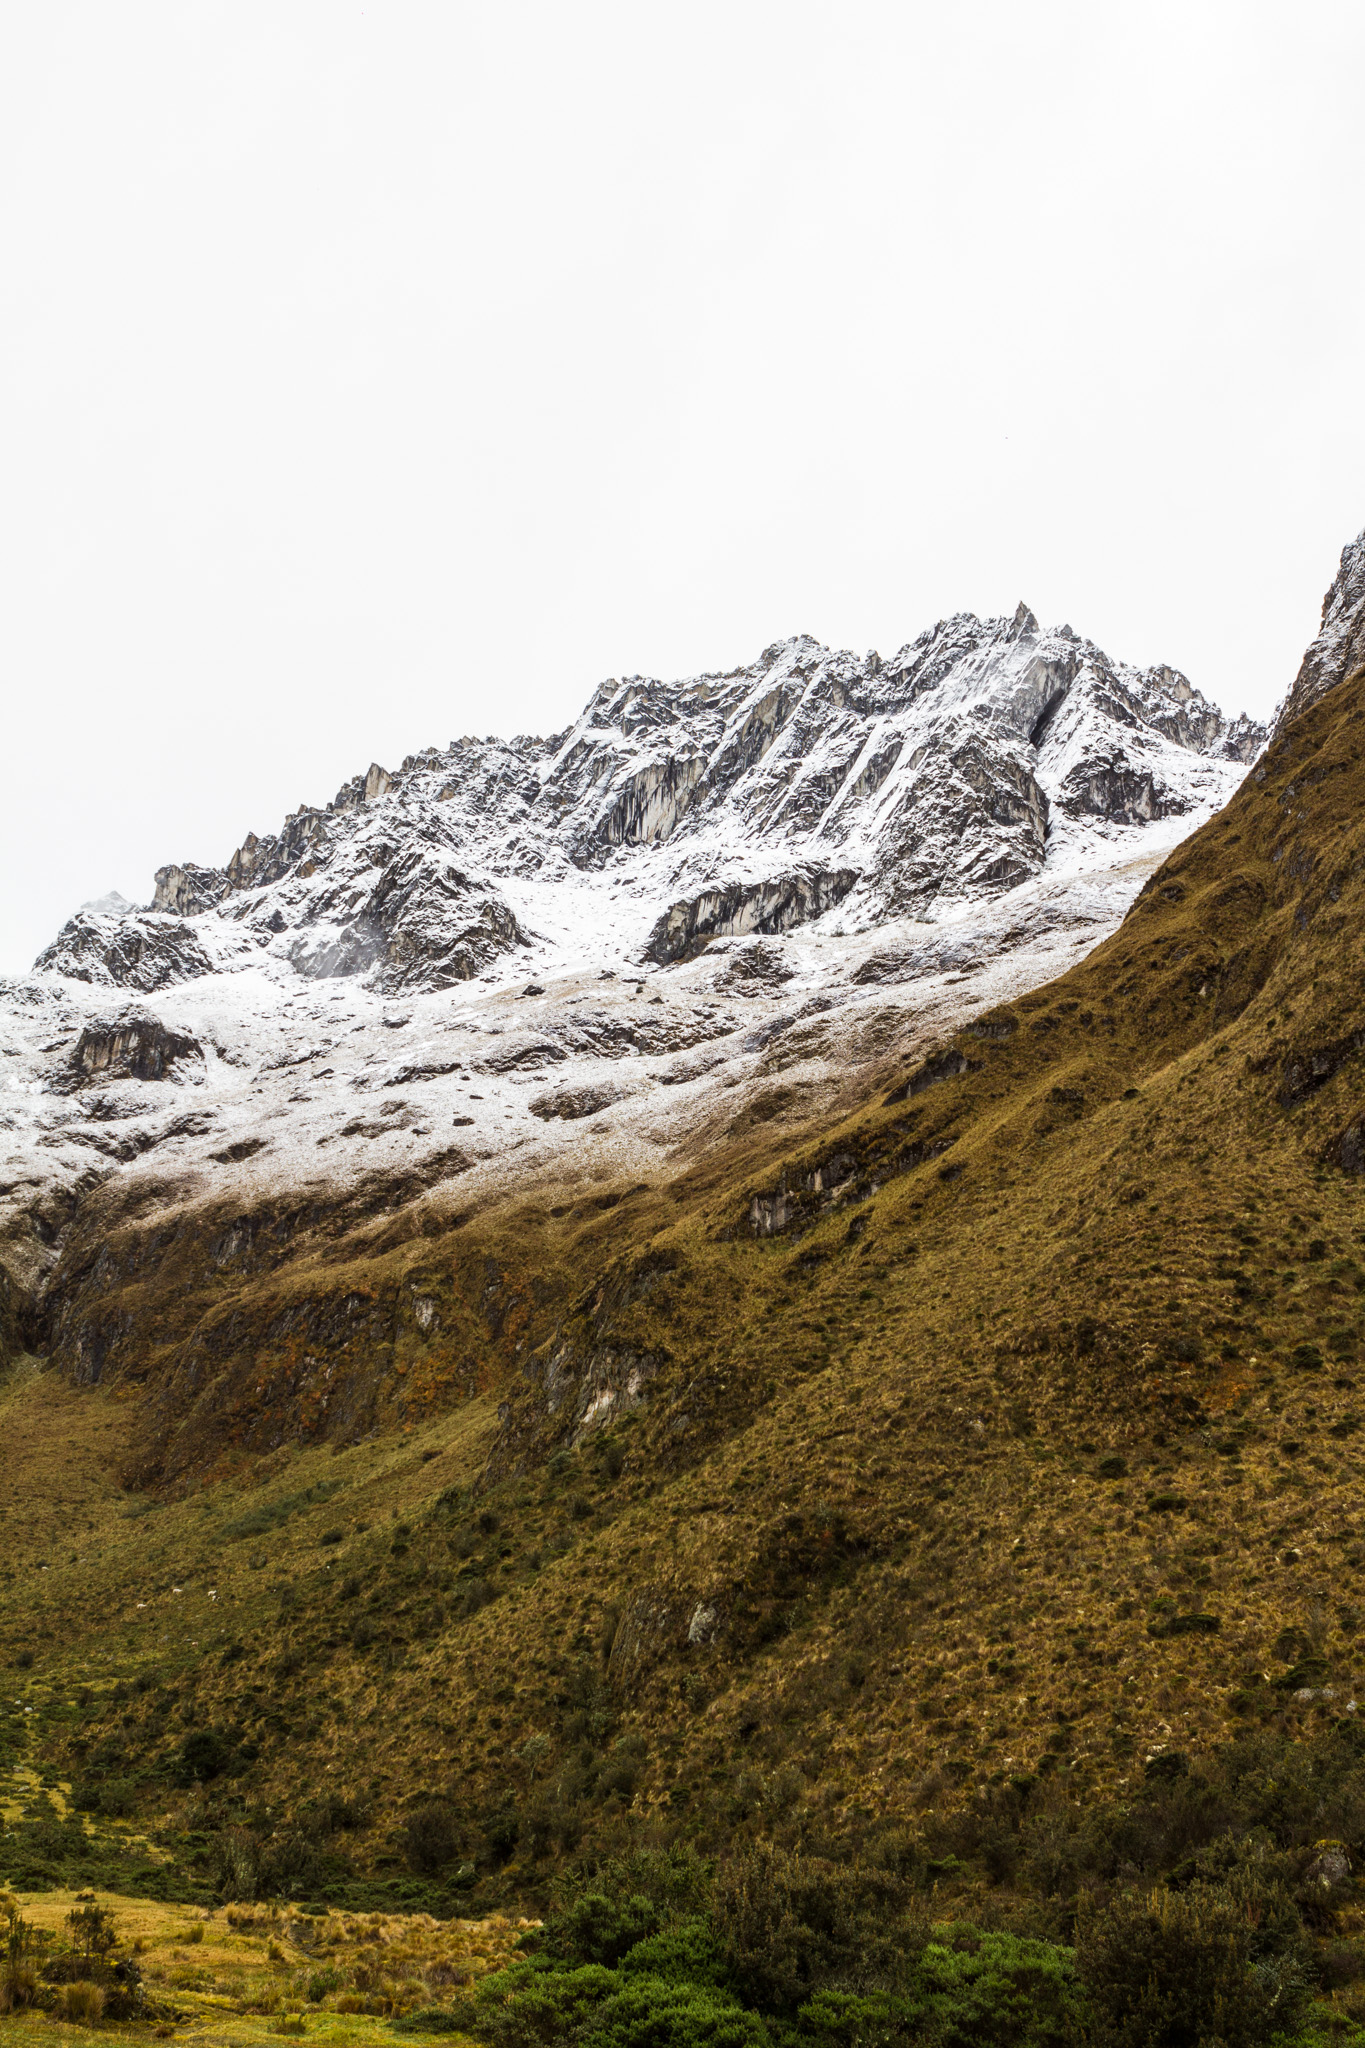 Ali-Barqawi-Studios-Explore-Series-Travel-Adventure-Documentary-C4CGAZA-Peru-MachuPicchu-2015-152.jpg